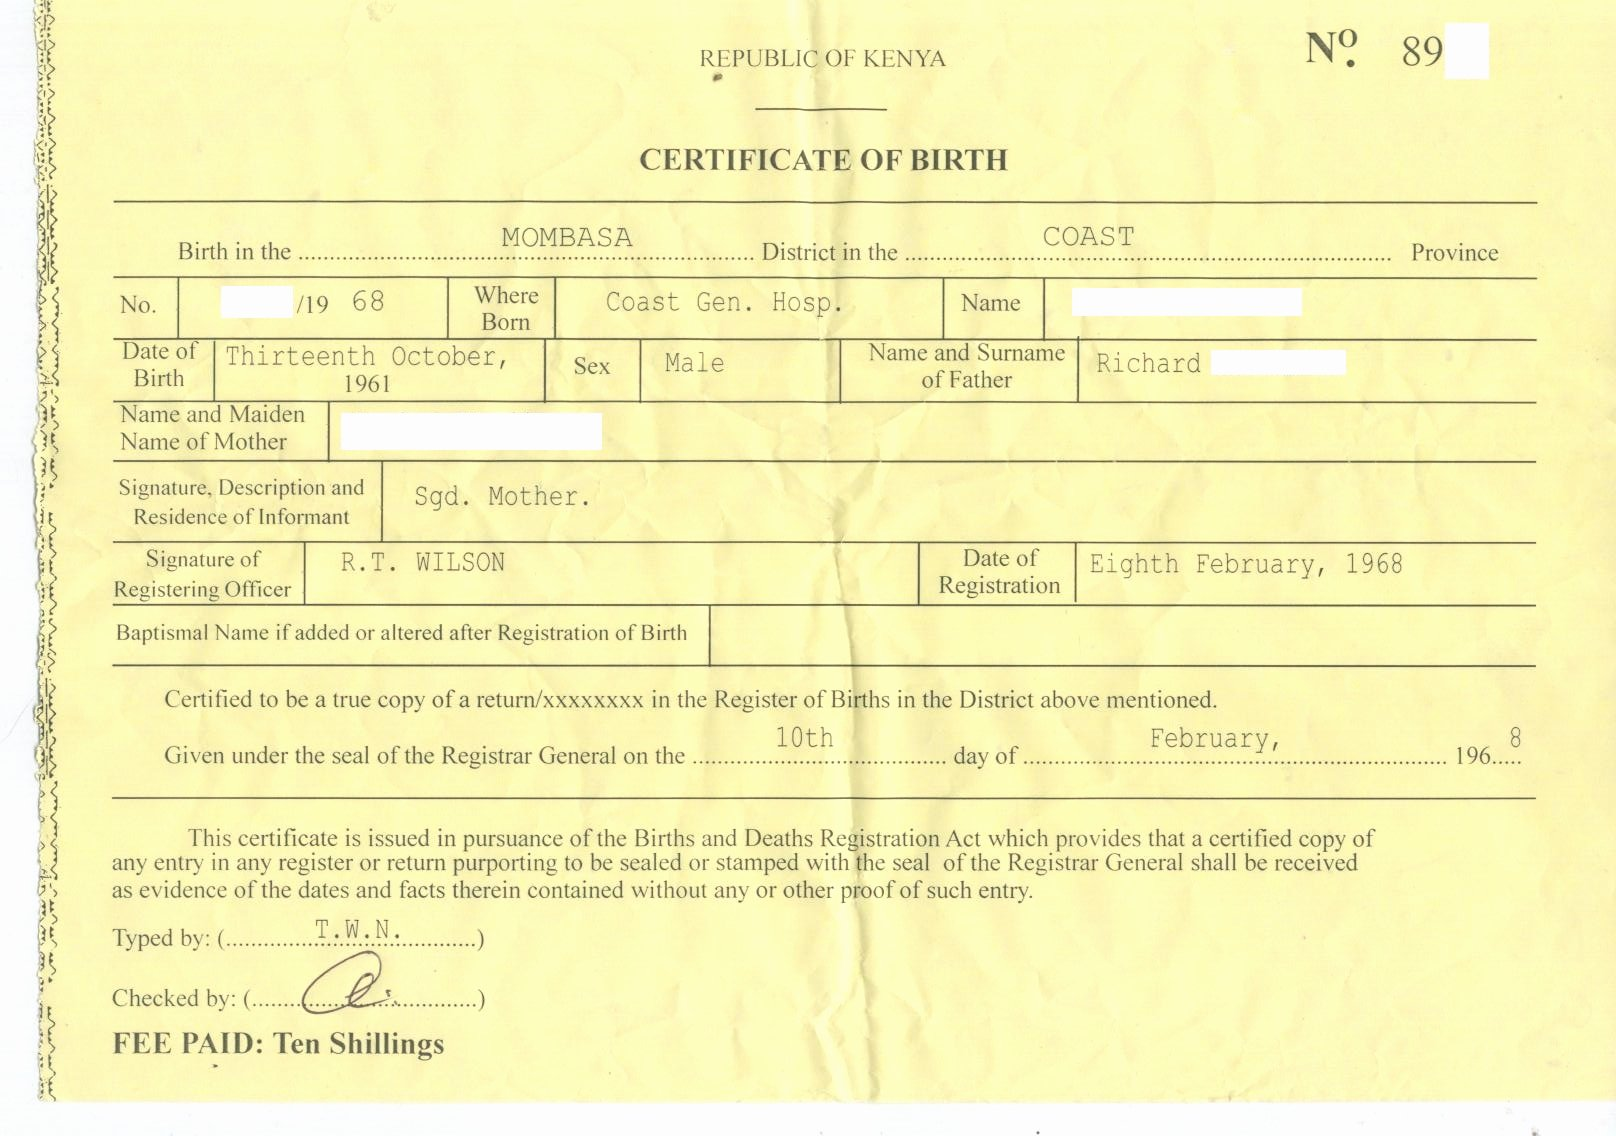 Free Fake Birth Certificate New Dr Conspiracy's First Fake Kenyan Birth Certificate